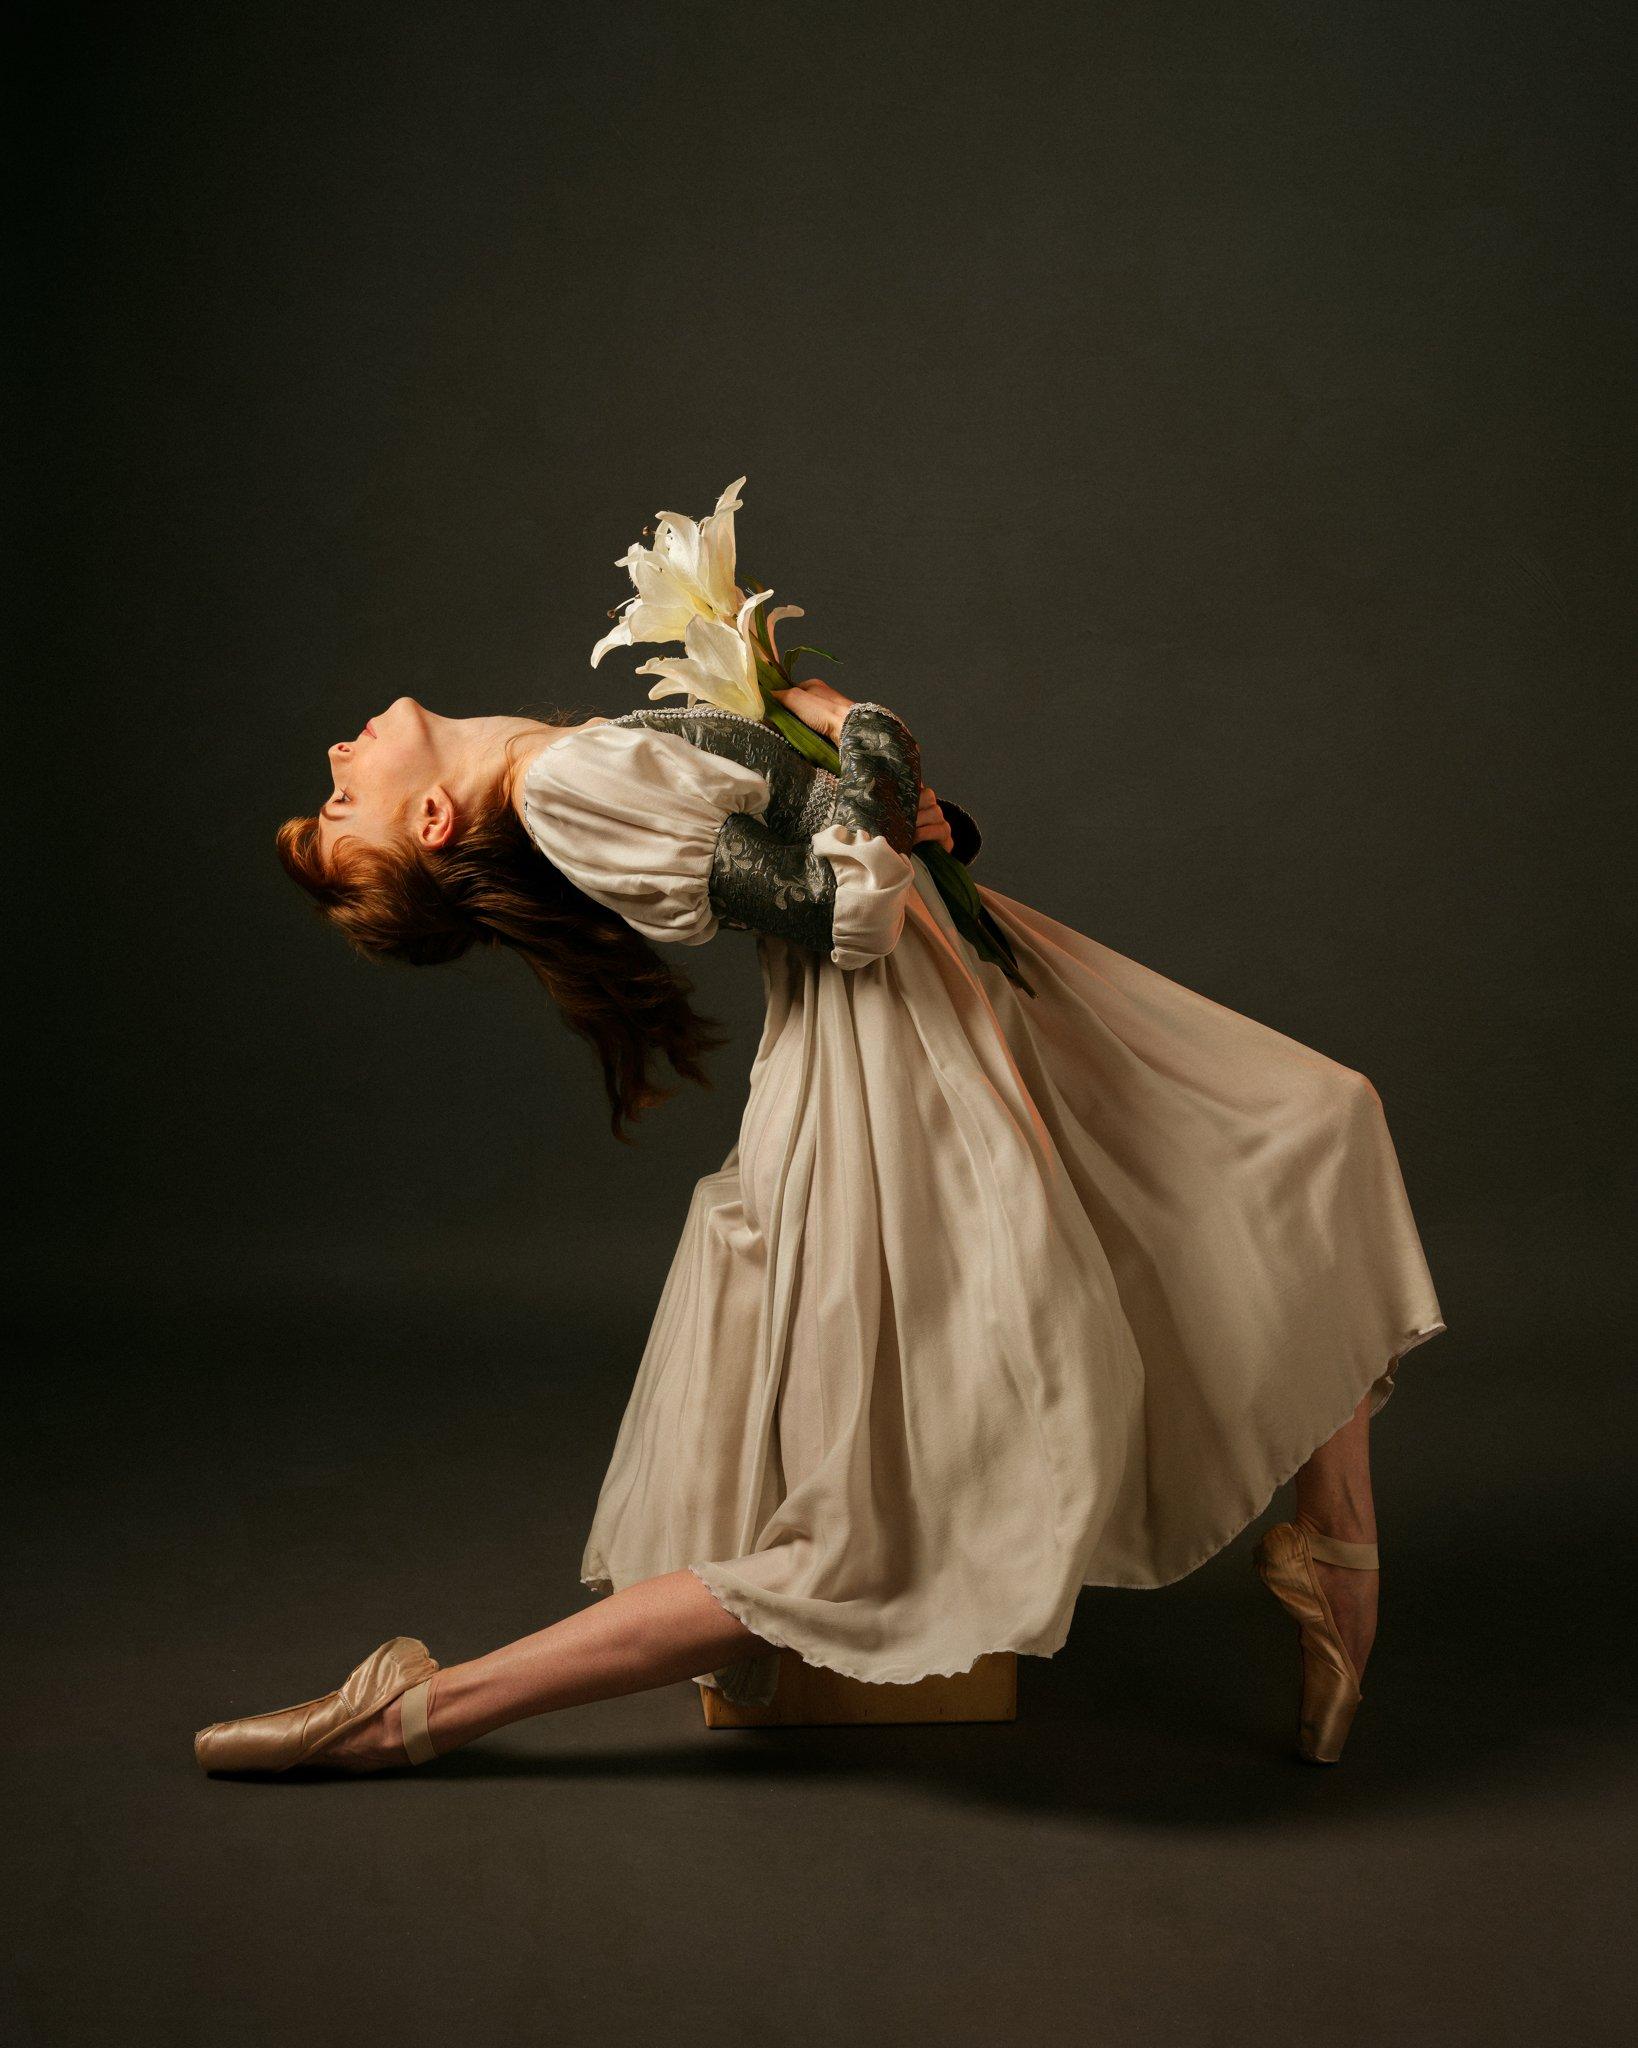 ballet, dancer, portrait, studio, ballerina, redhead, mood, girl, fashion, Saulius Ke